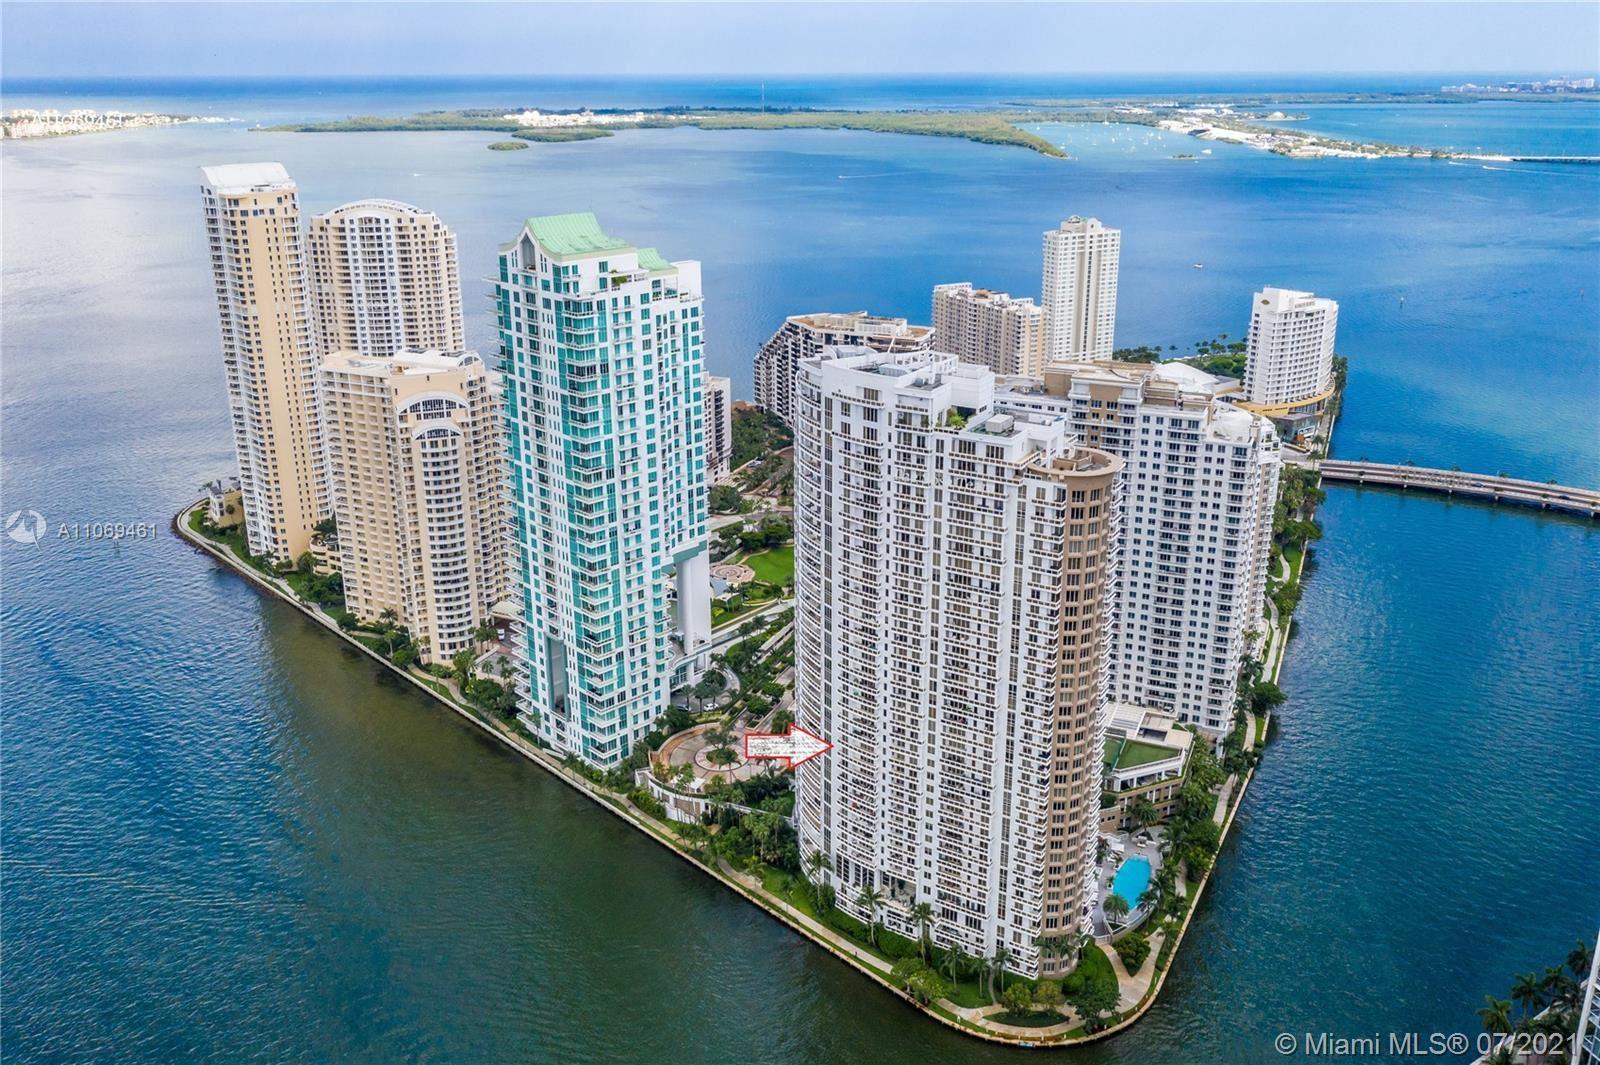 901 Brickell Key Blvd #1406, Miami, FL 33131 - #: A11069461